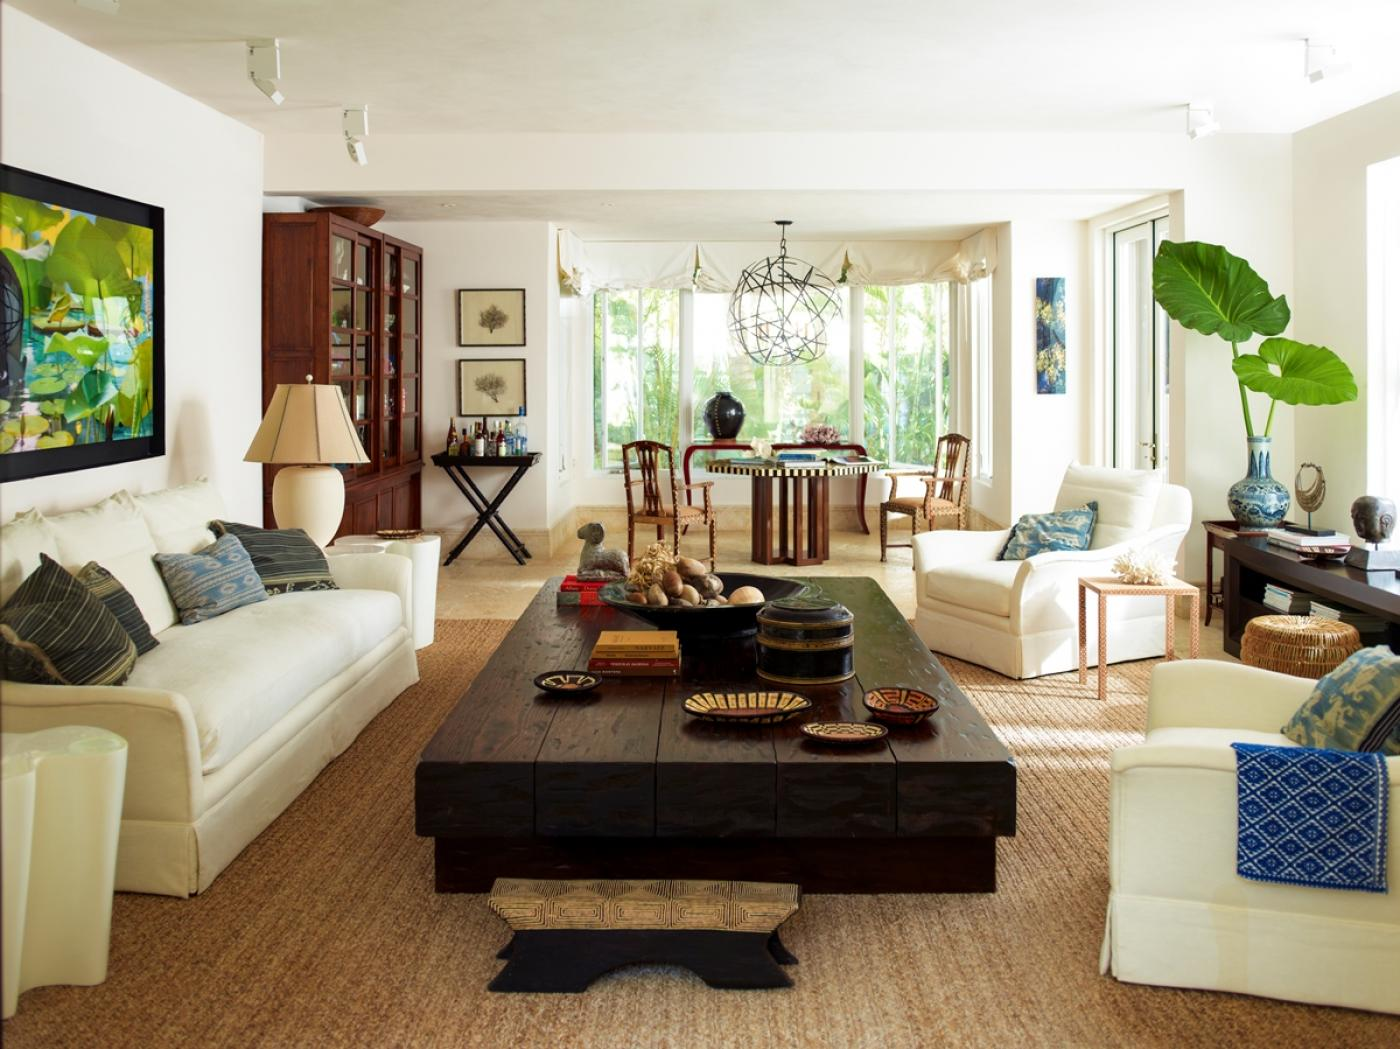 Las hamacas residence lush serene paradise by juan - Home interior decoration ideas ...